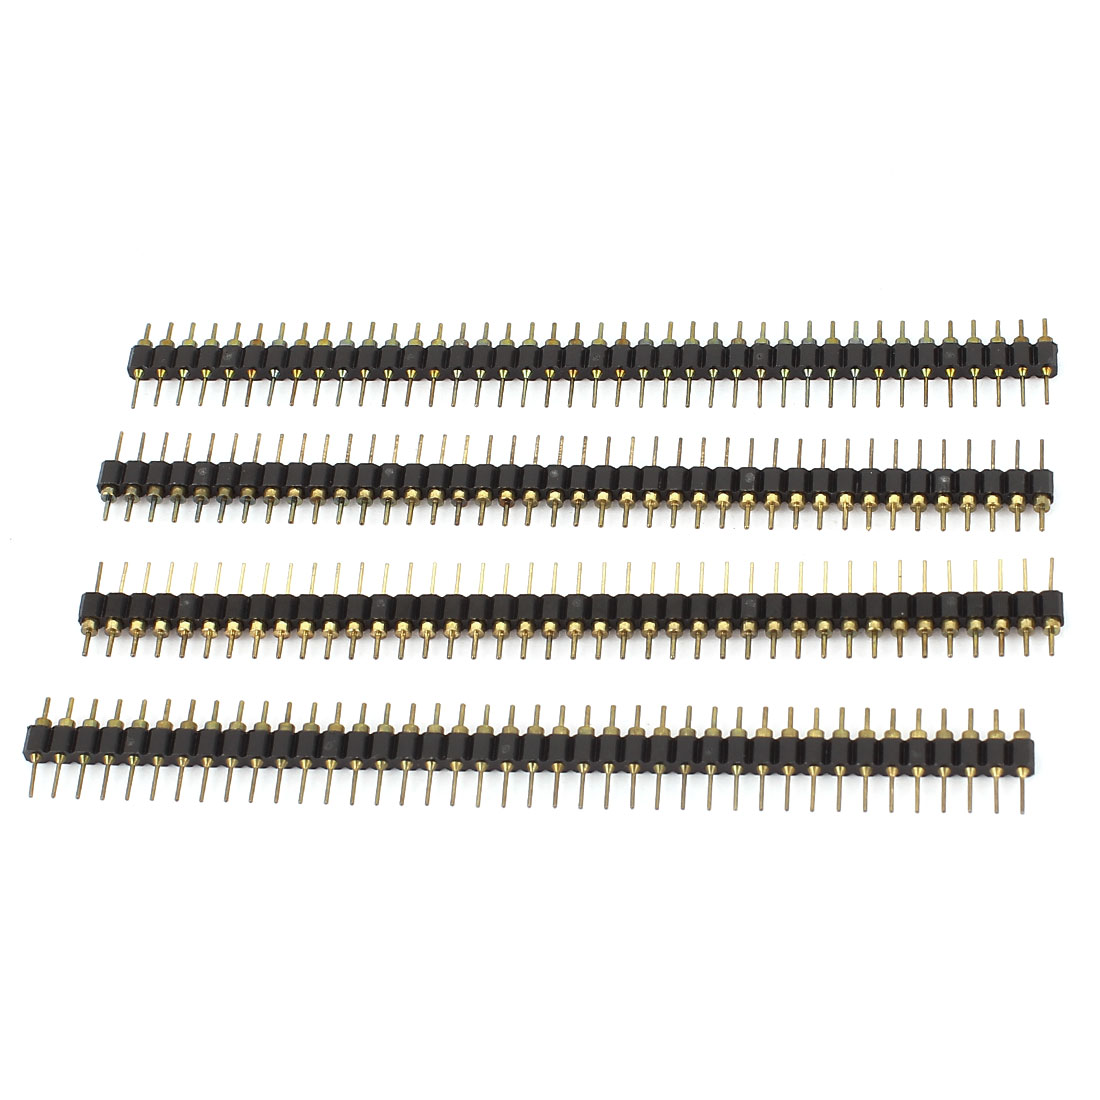 4Pcs 40Pin 2.54mm Pitch Single Row Straight Male Pin Header